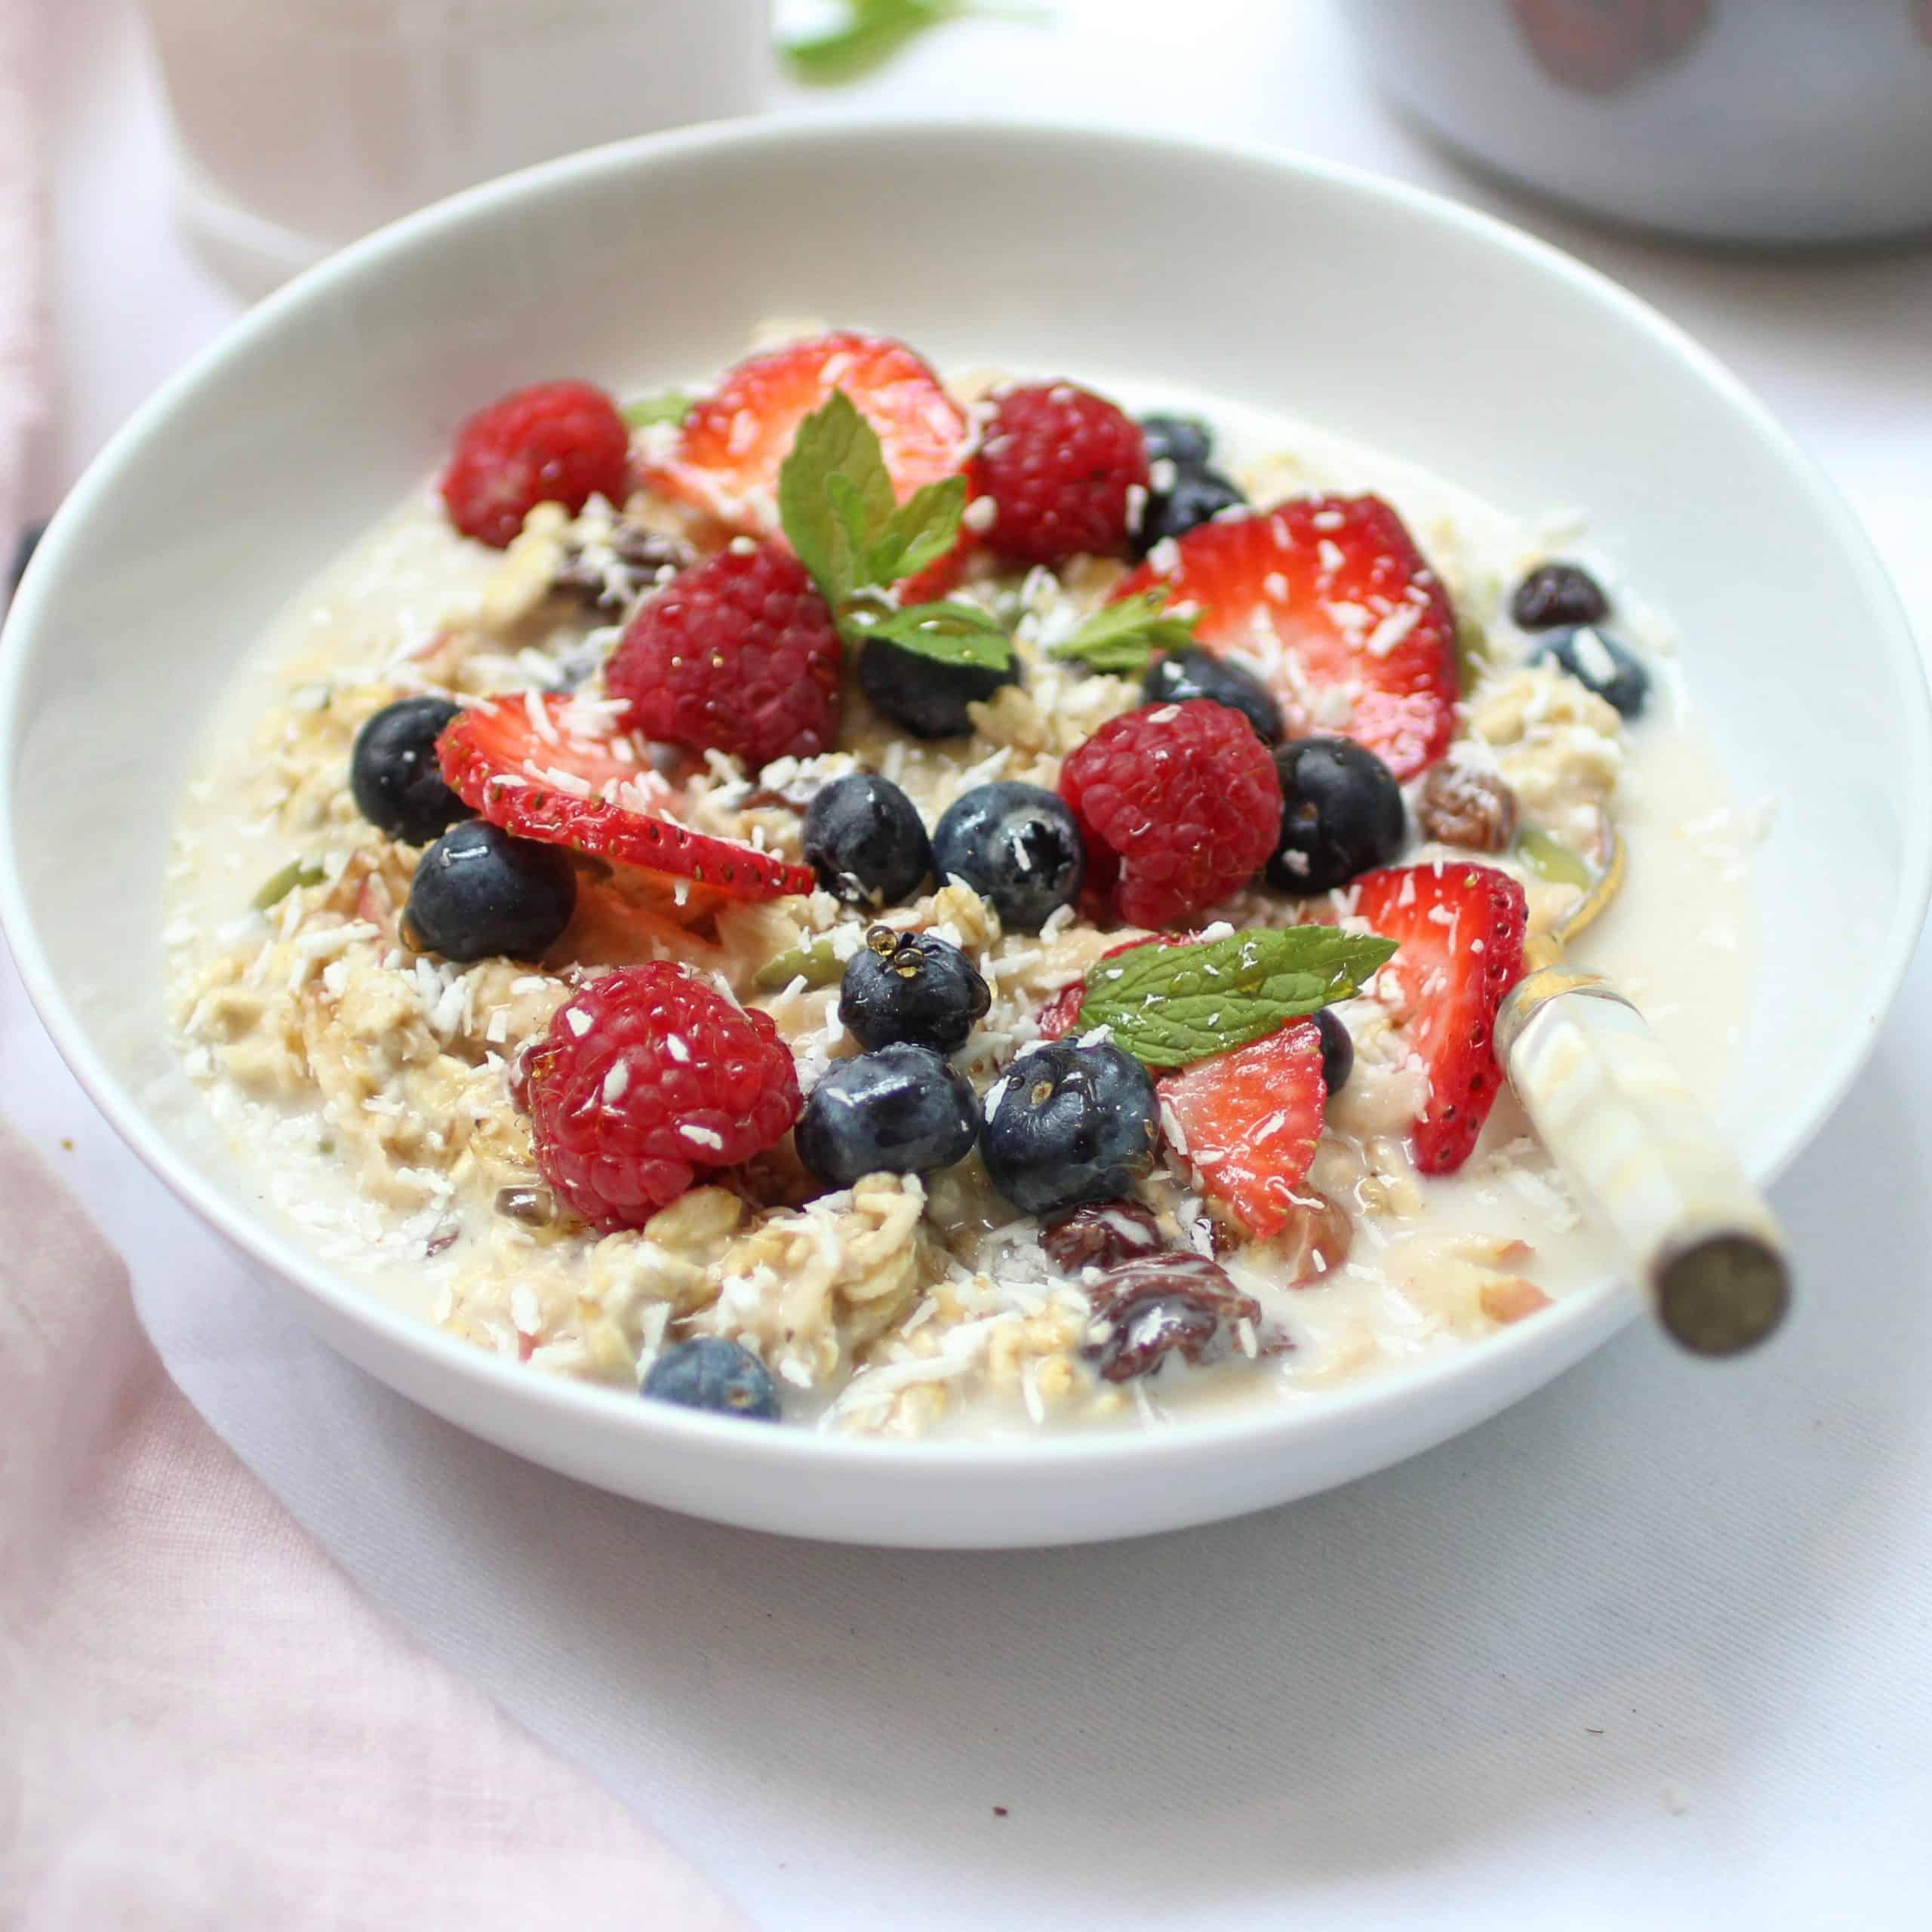 vegan bircher muesli for breakfast!